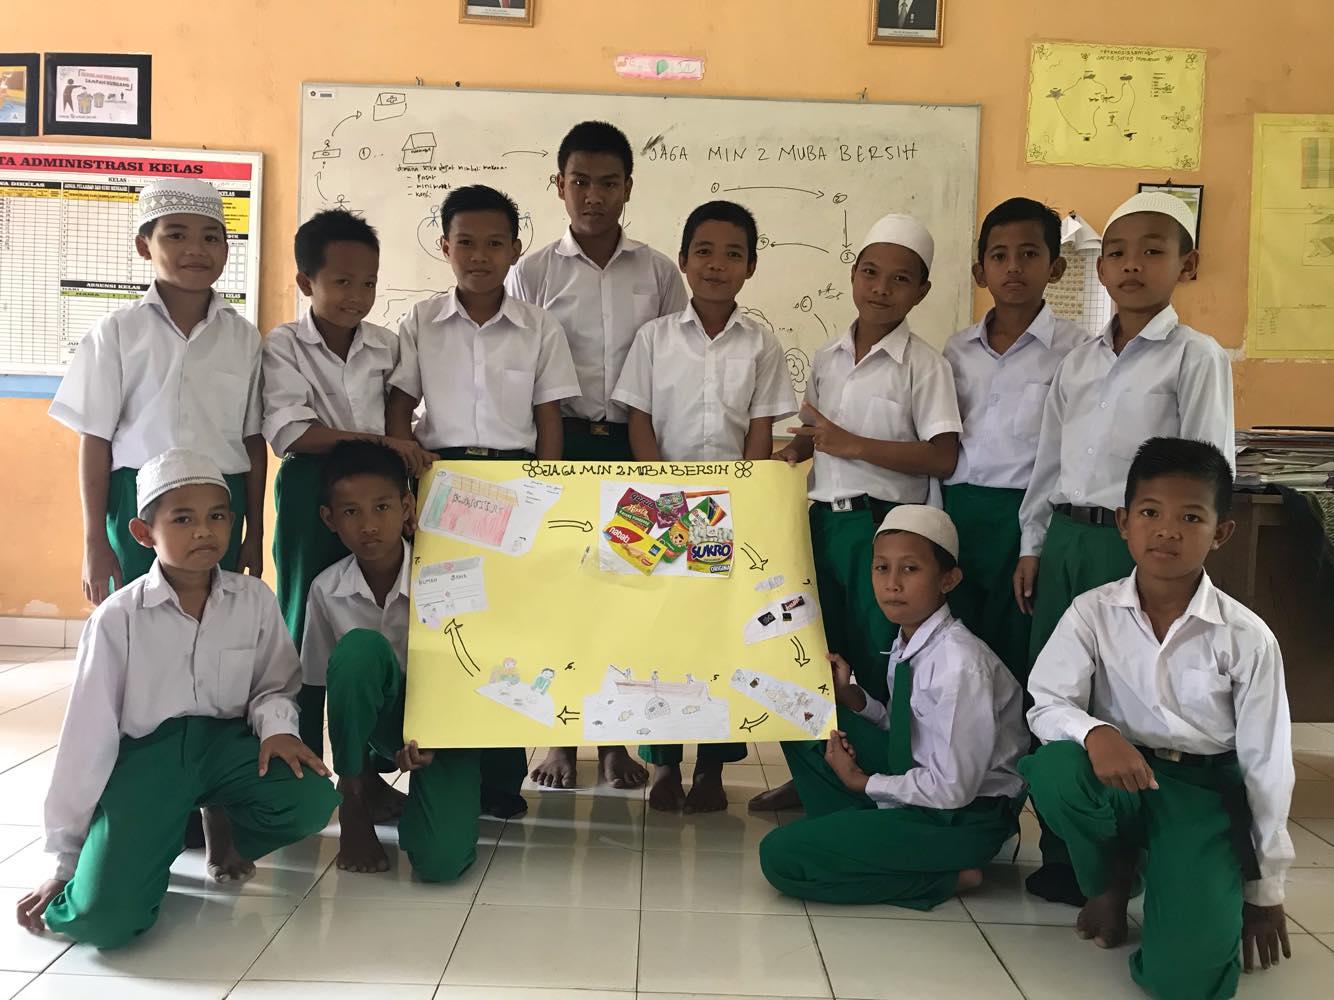 Mardan Erwinsyah, MIN 2 Musi Banyuasin-Eco Poster (1)